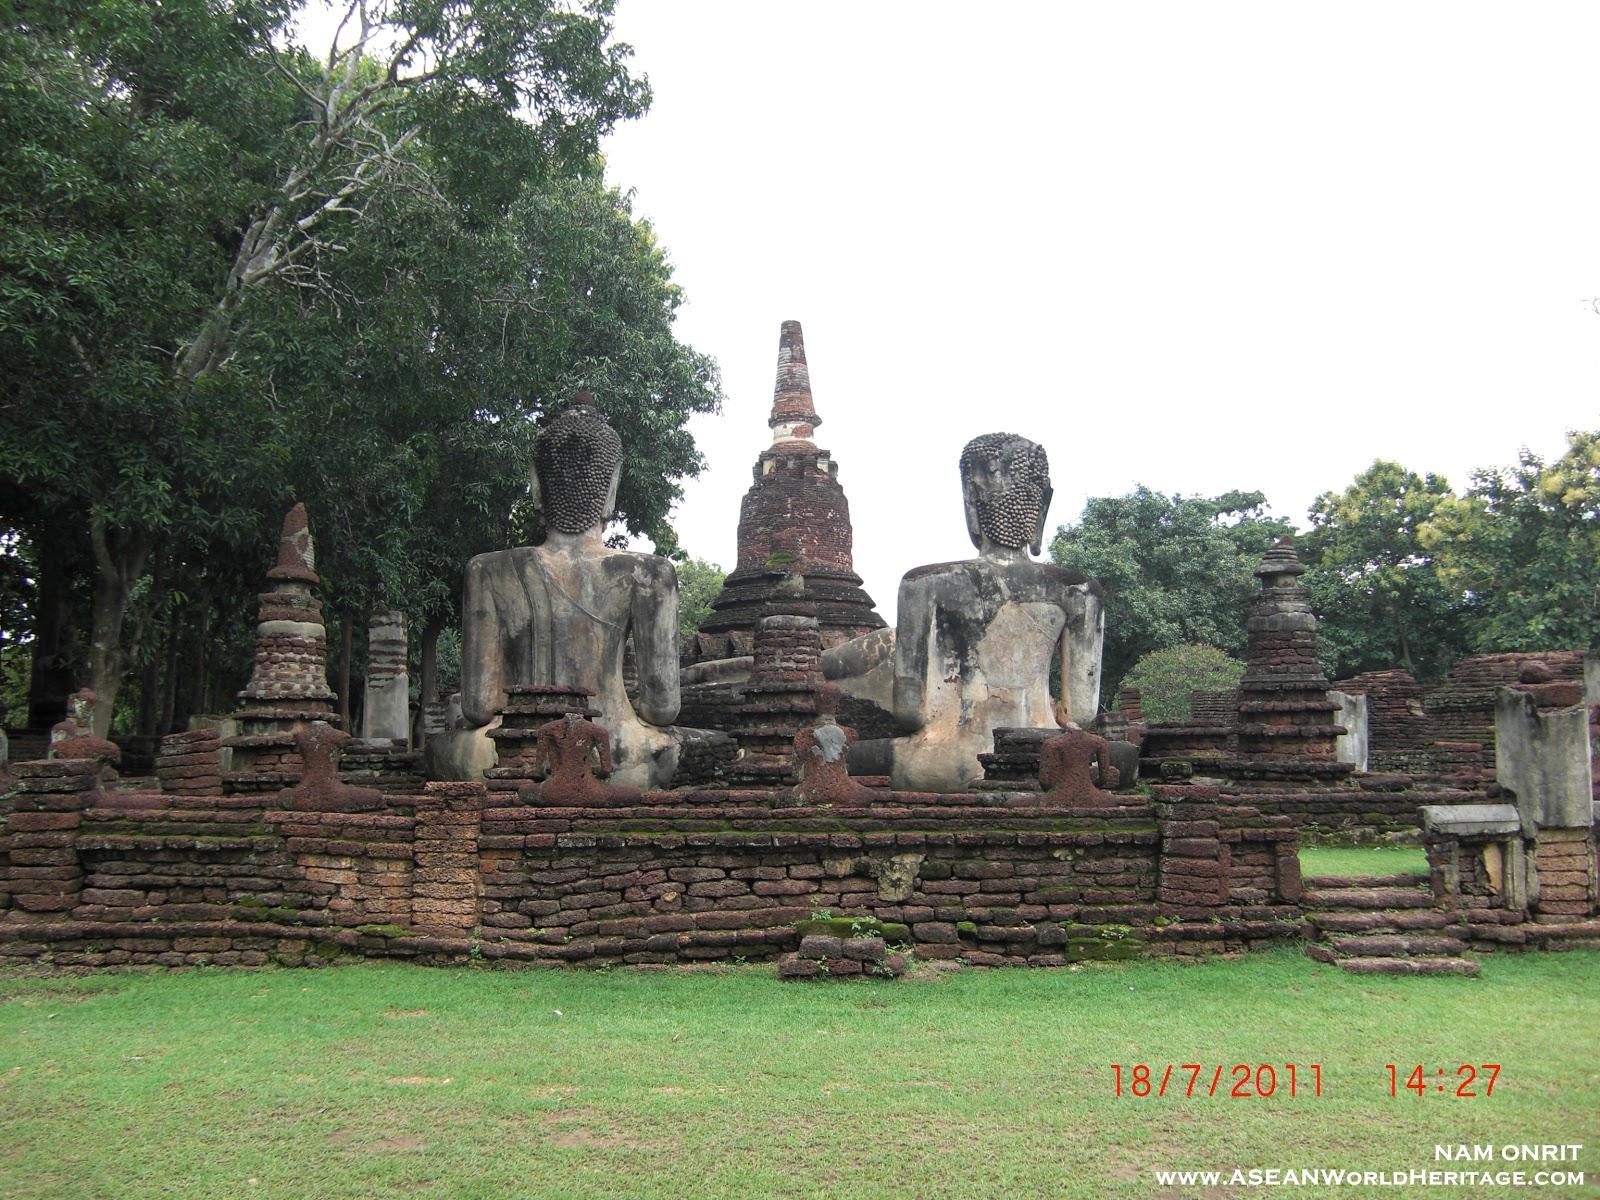 Town: Kamphaeng Phet Historical Park - ASEAN World Heritage